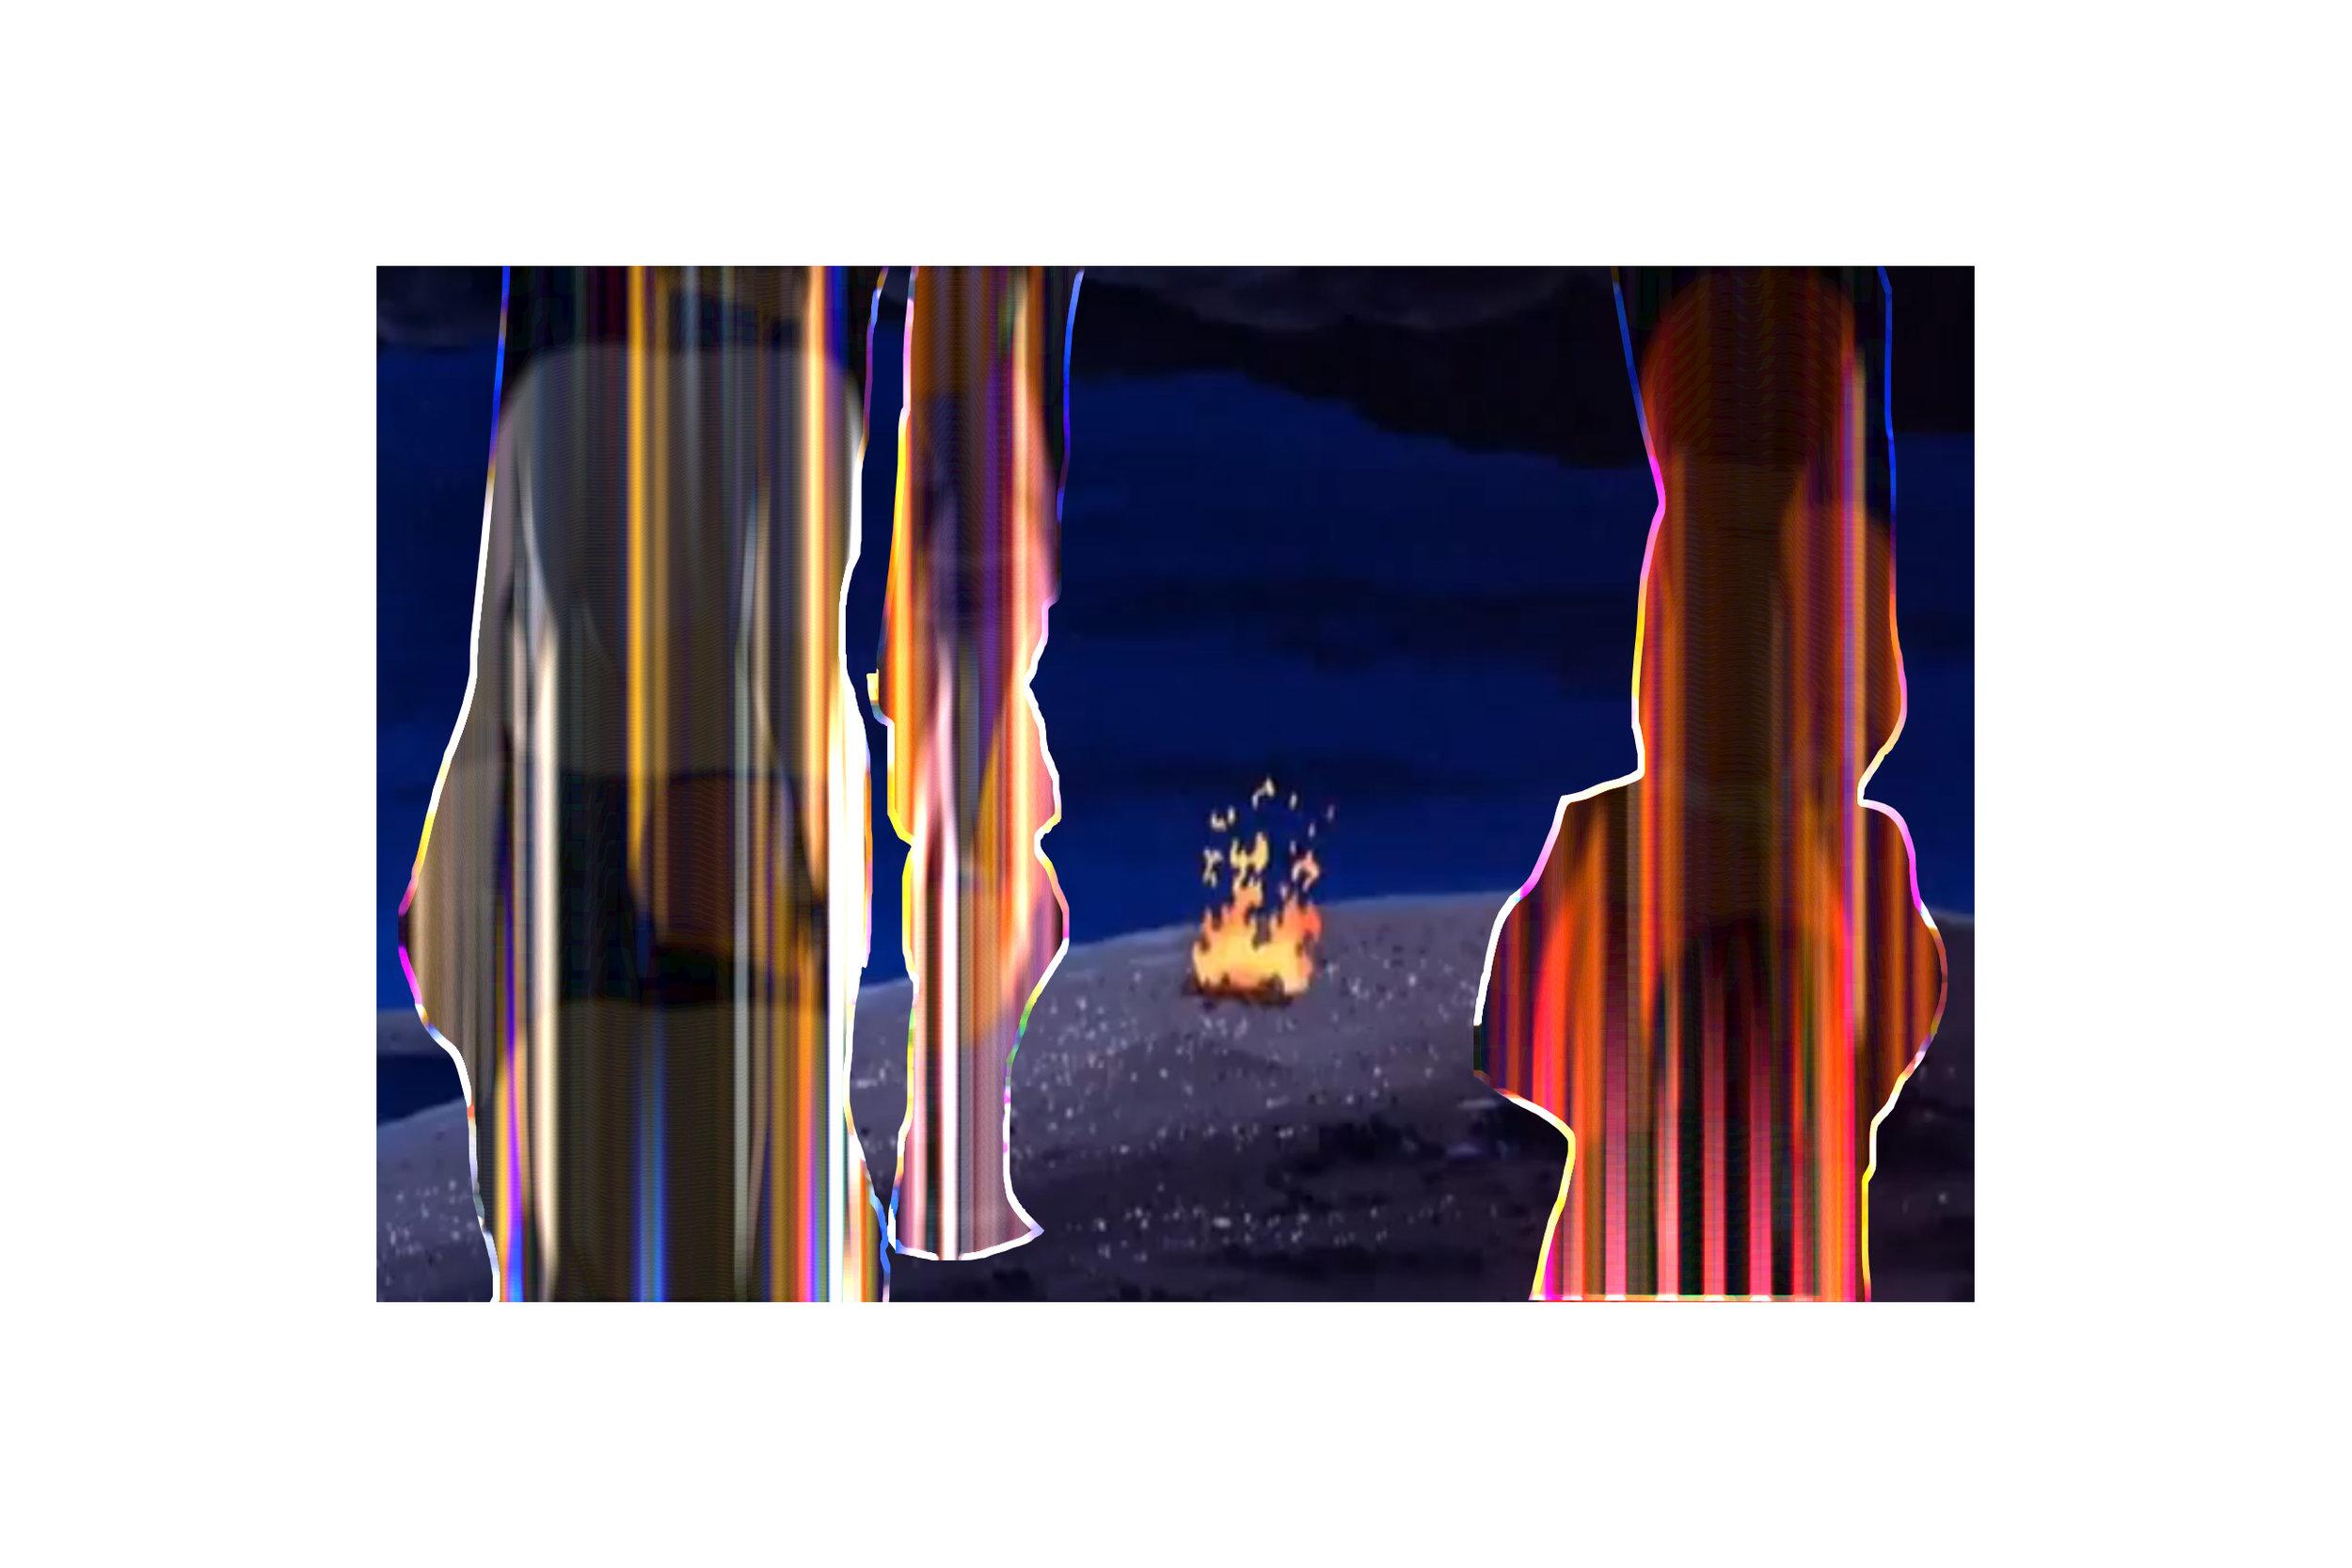 Conjurings, Digital Collage, 2013